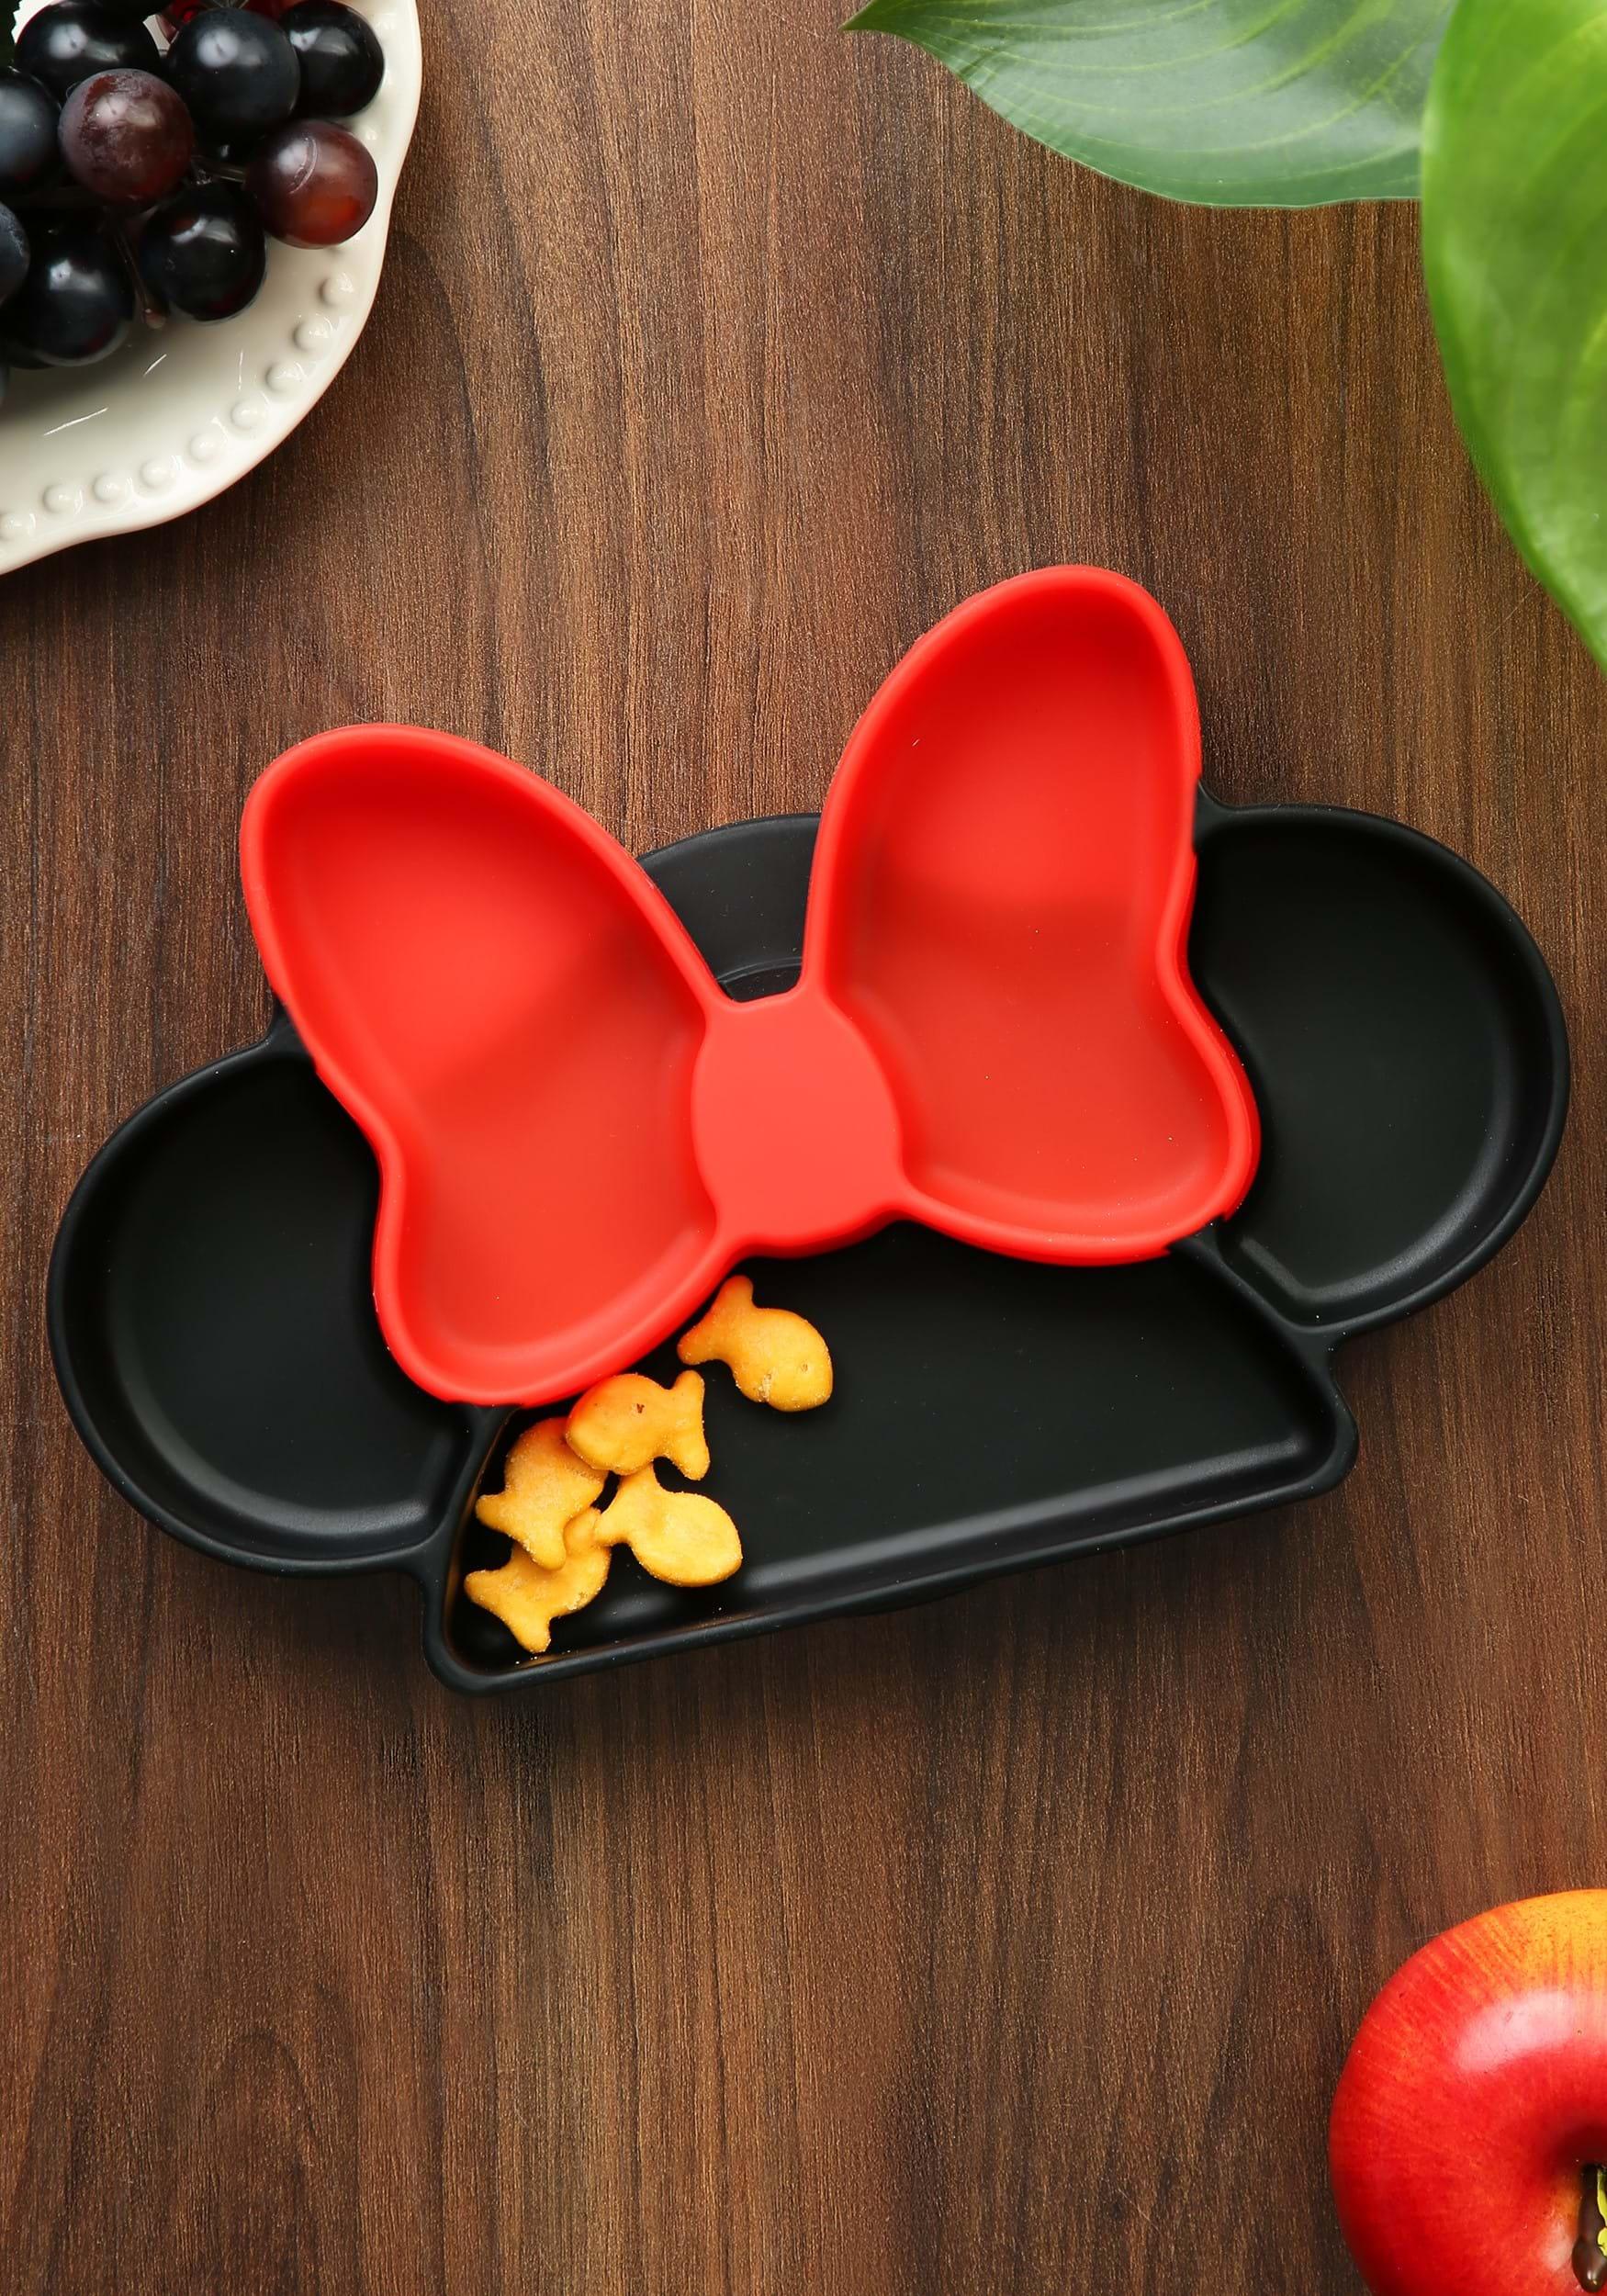 Minnie Mouse Disney Silicone Grip Dish